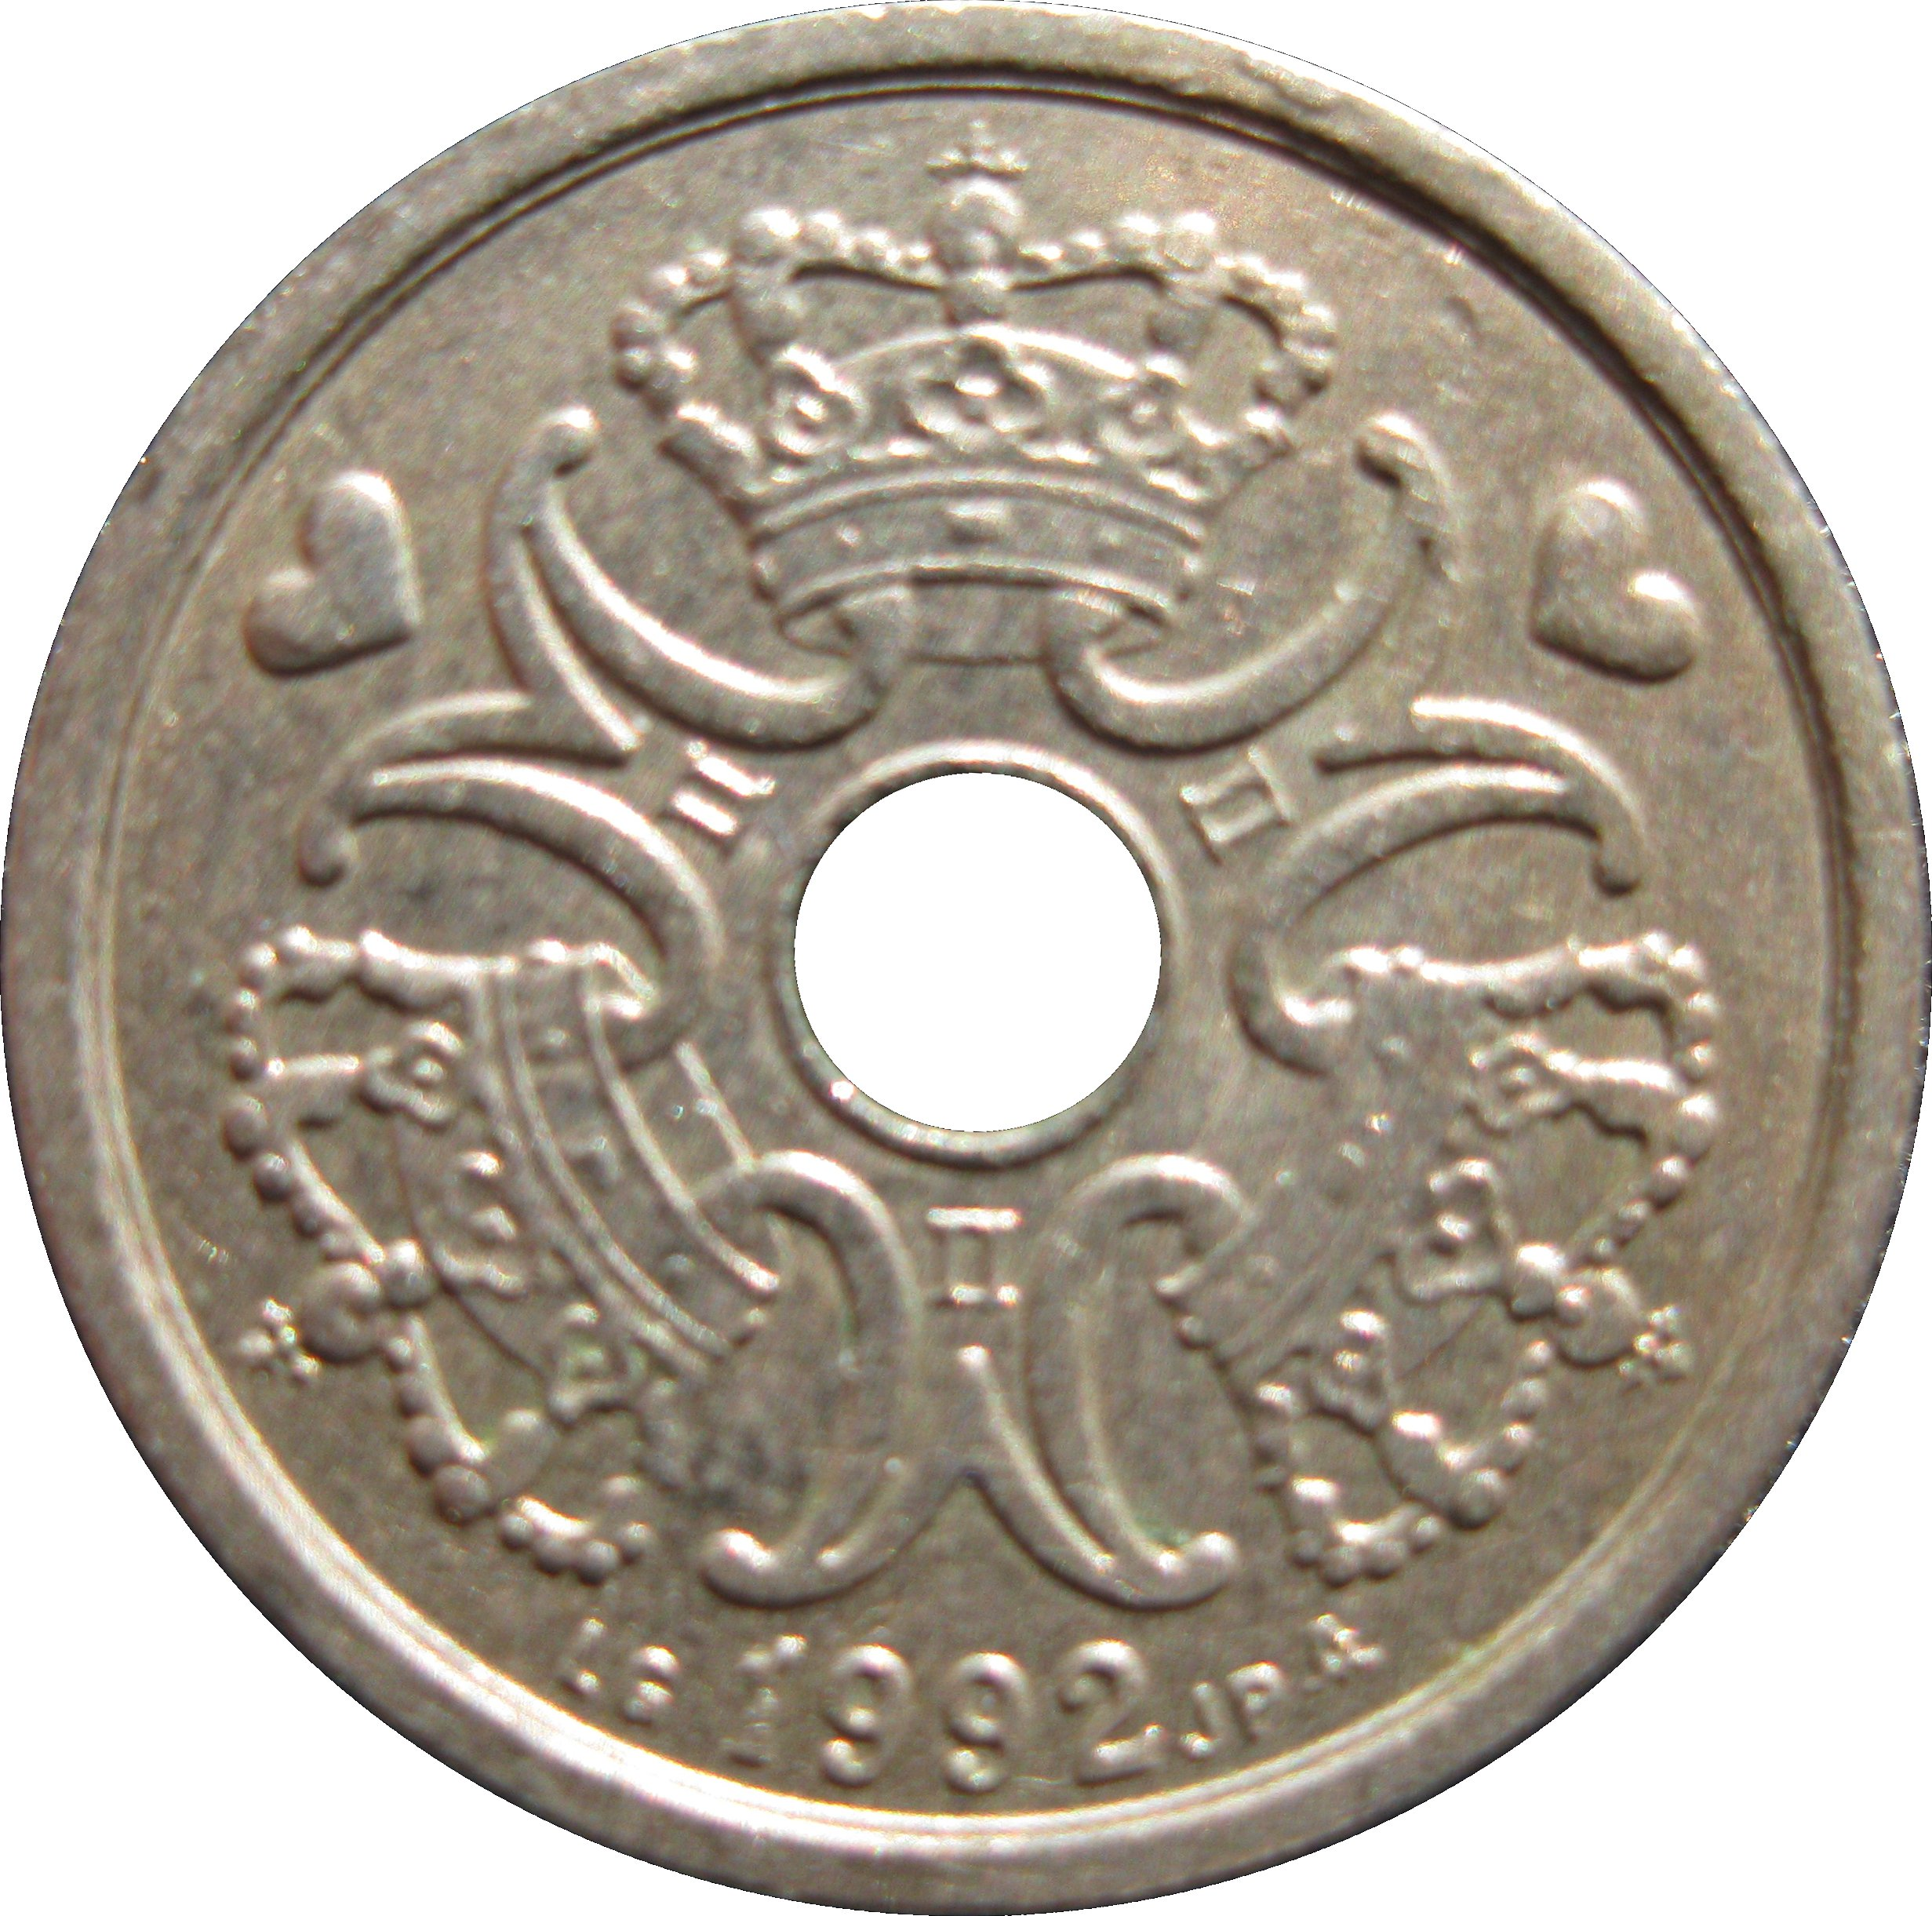 Kroner danmark альбом для монет 10 руб